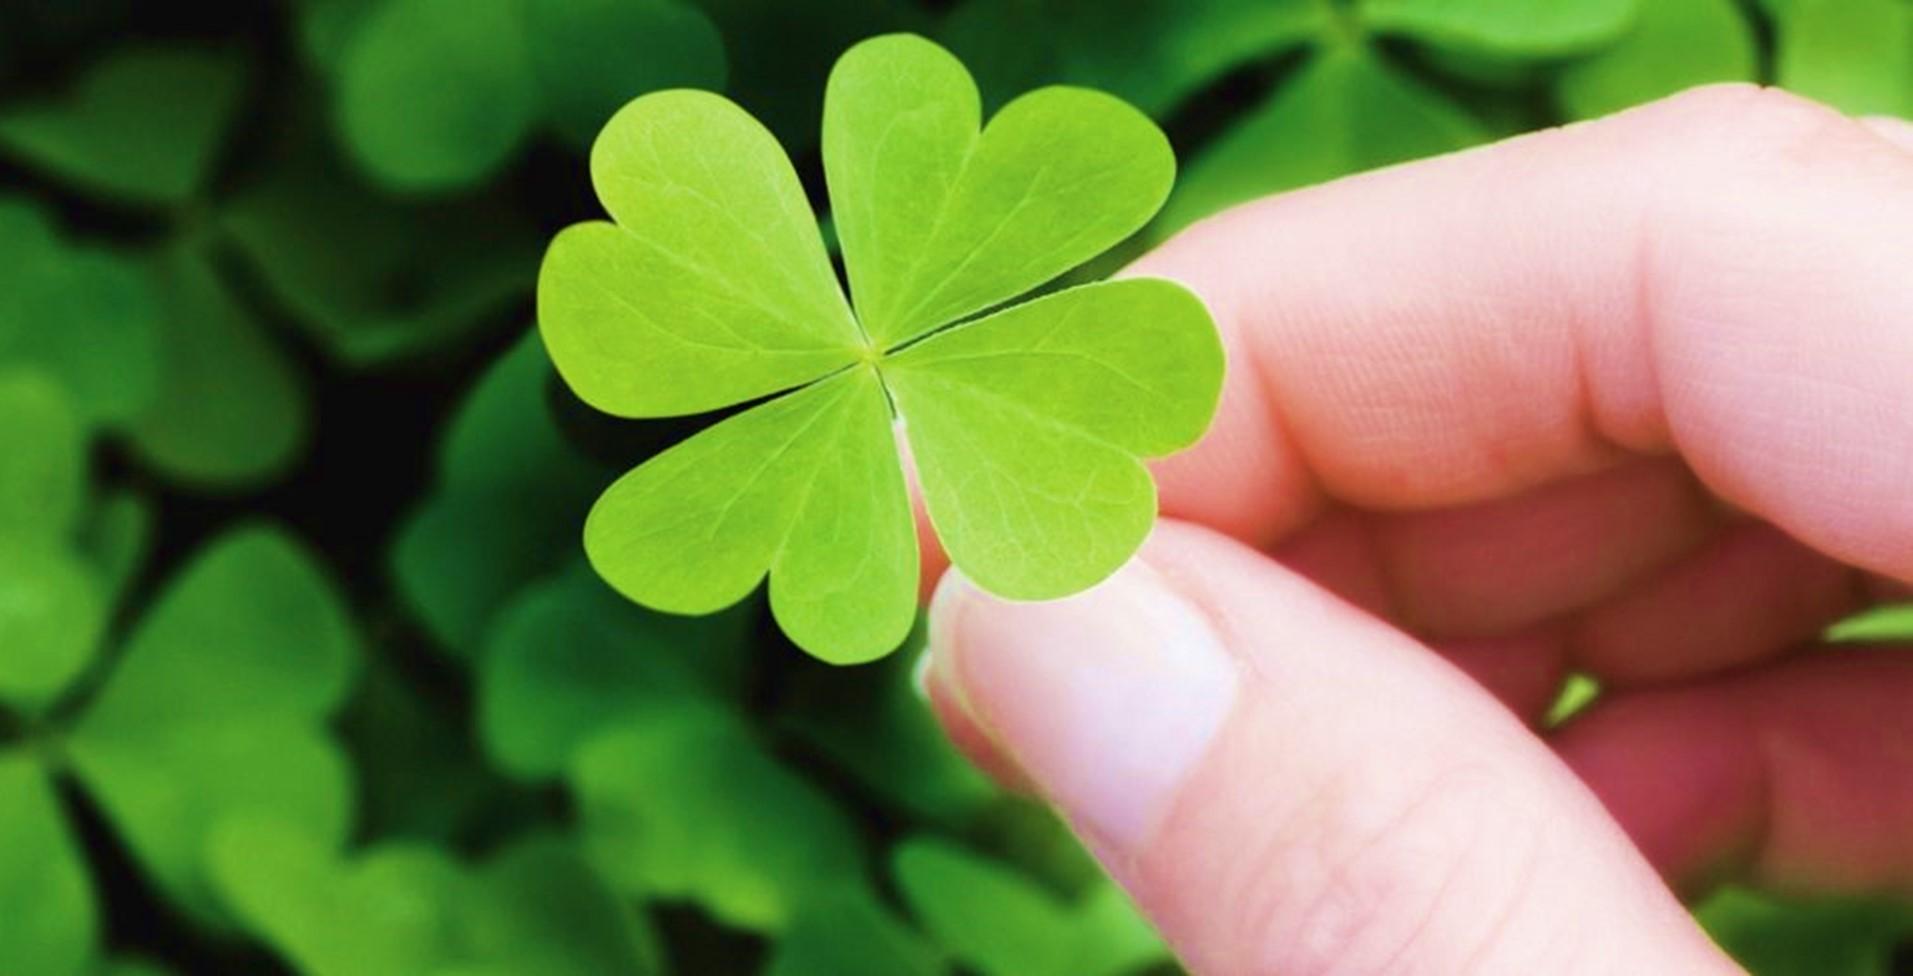 C mo tener m s buena suerte grandes pymes - Como tener buena suerte ...